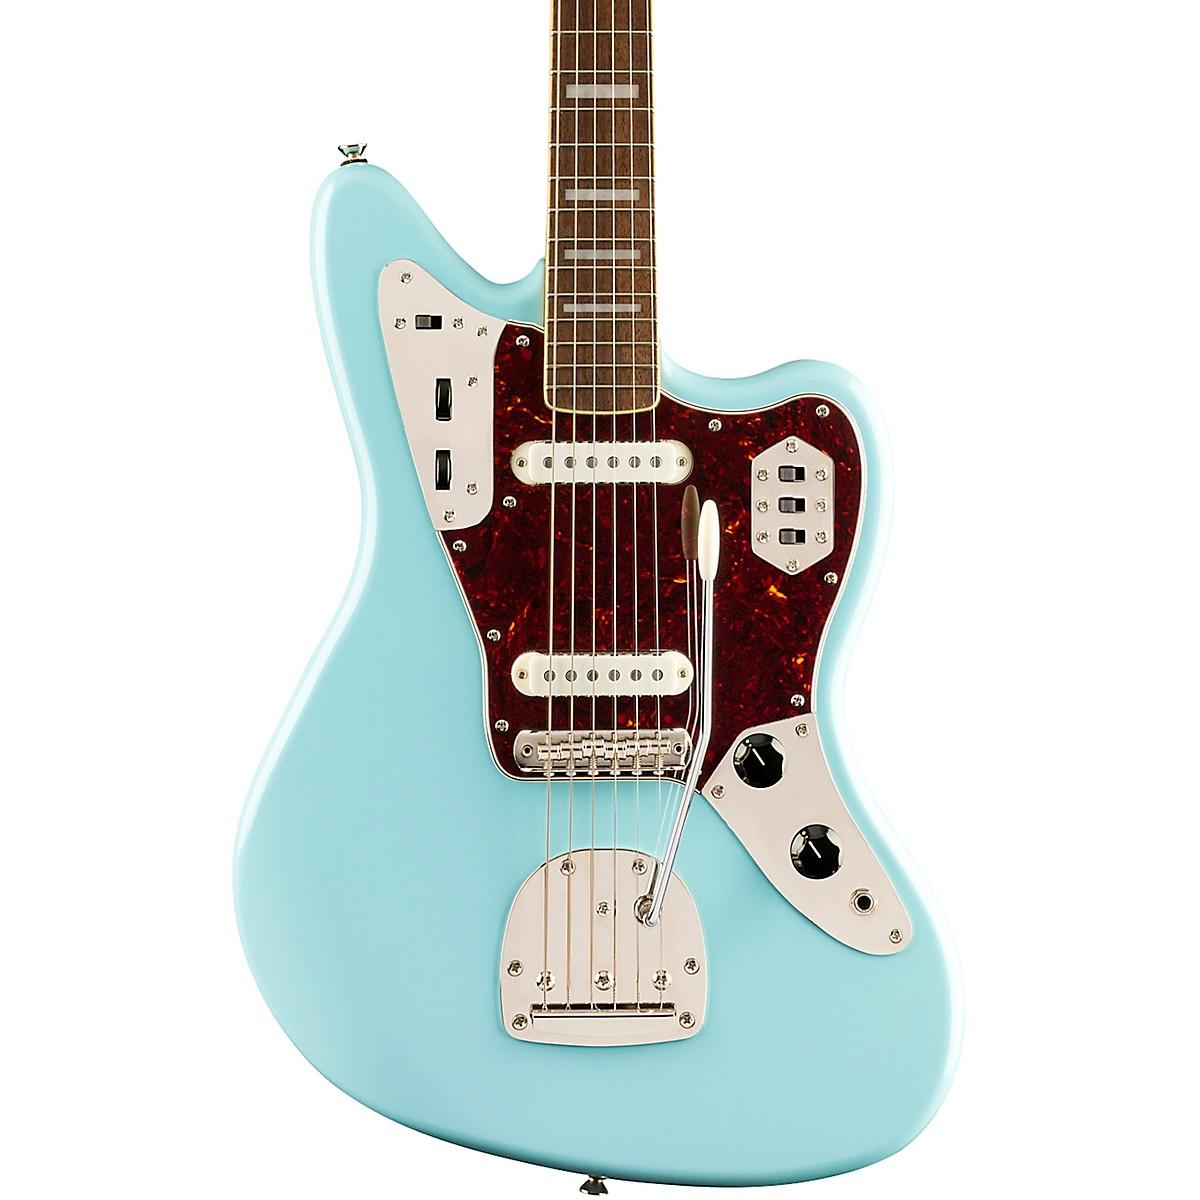 Squier Classic Vibe '70s Jaguar Limited Edition Electric Guitar